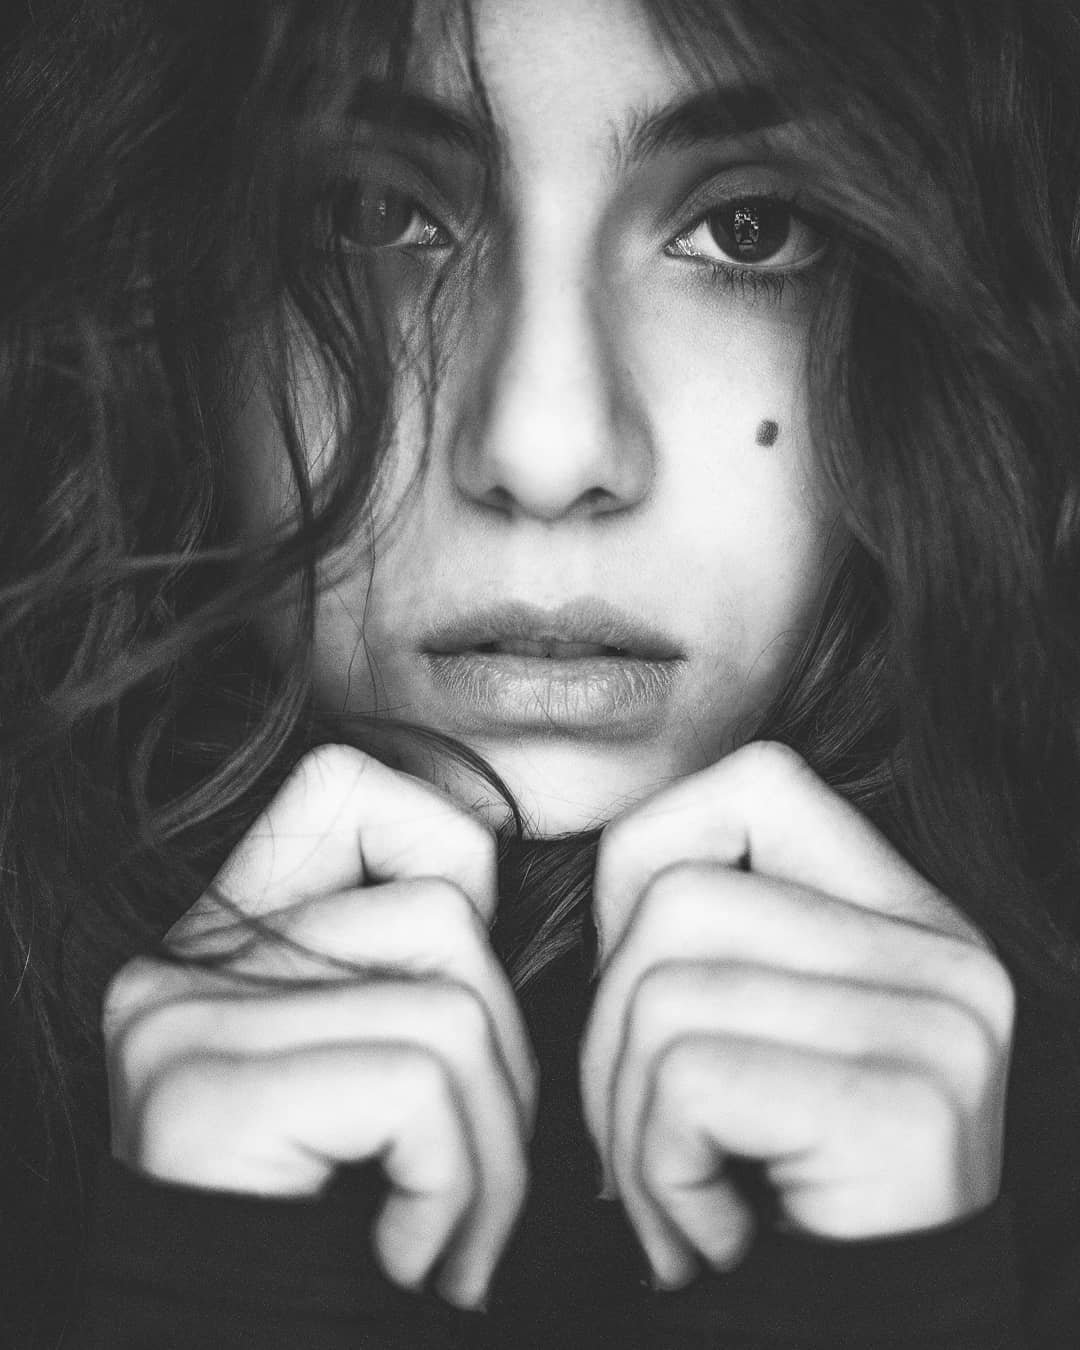 beautiful_black_and_white_portrait_photography_41.jpg